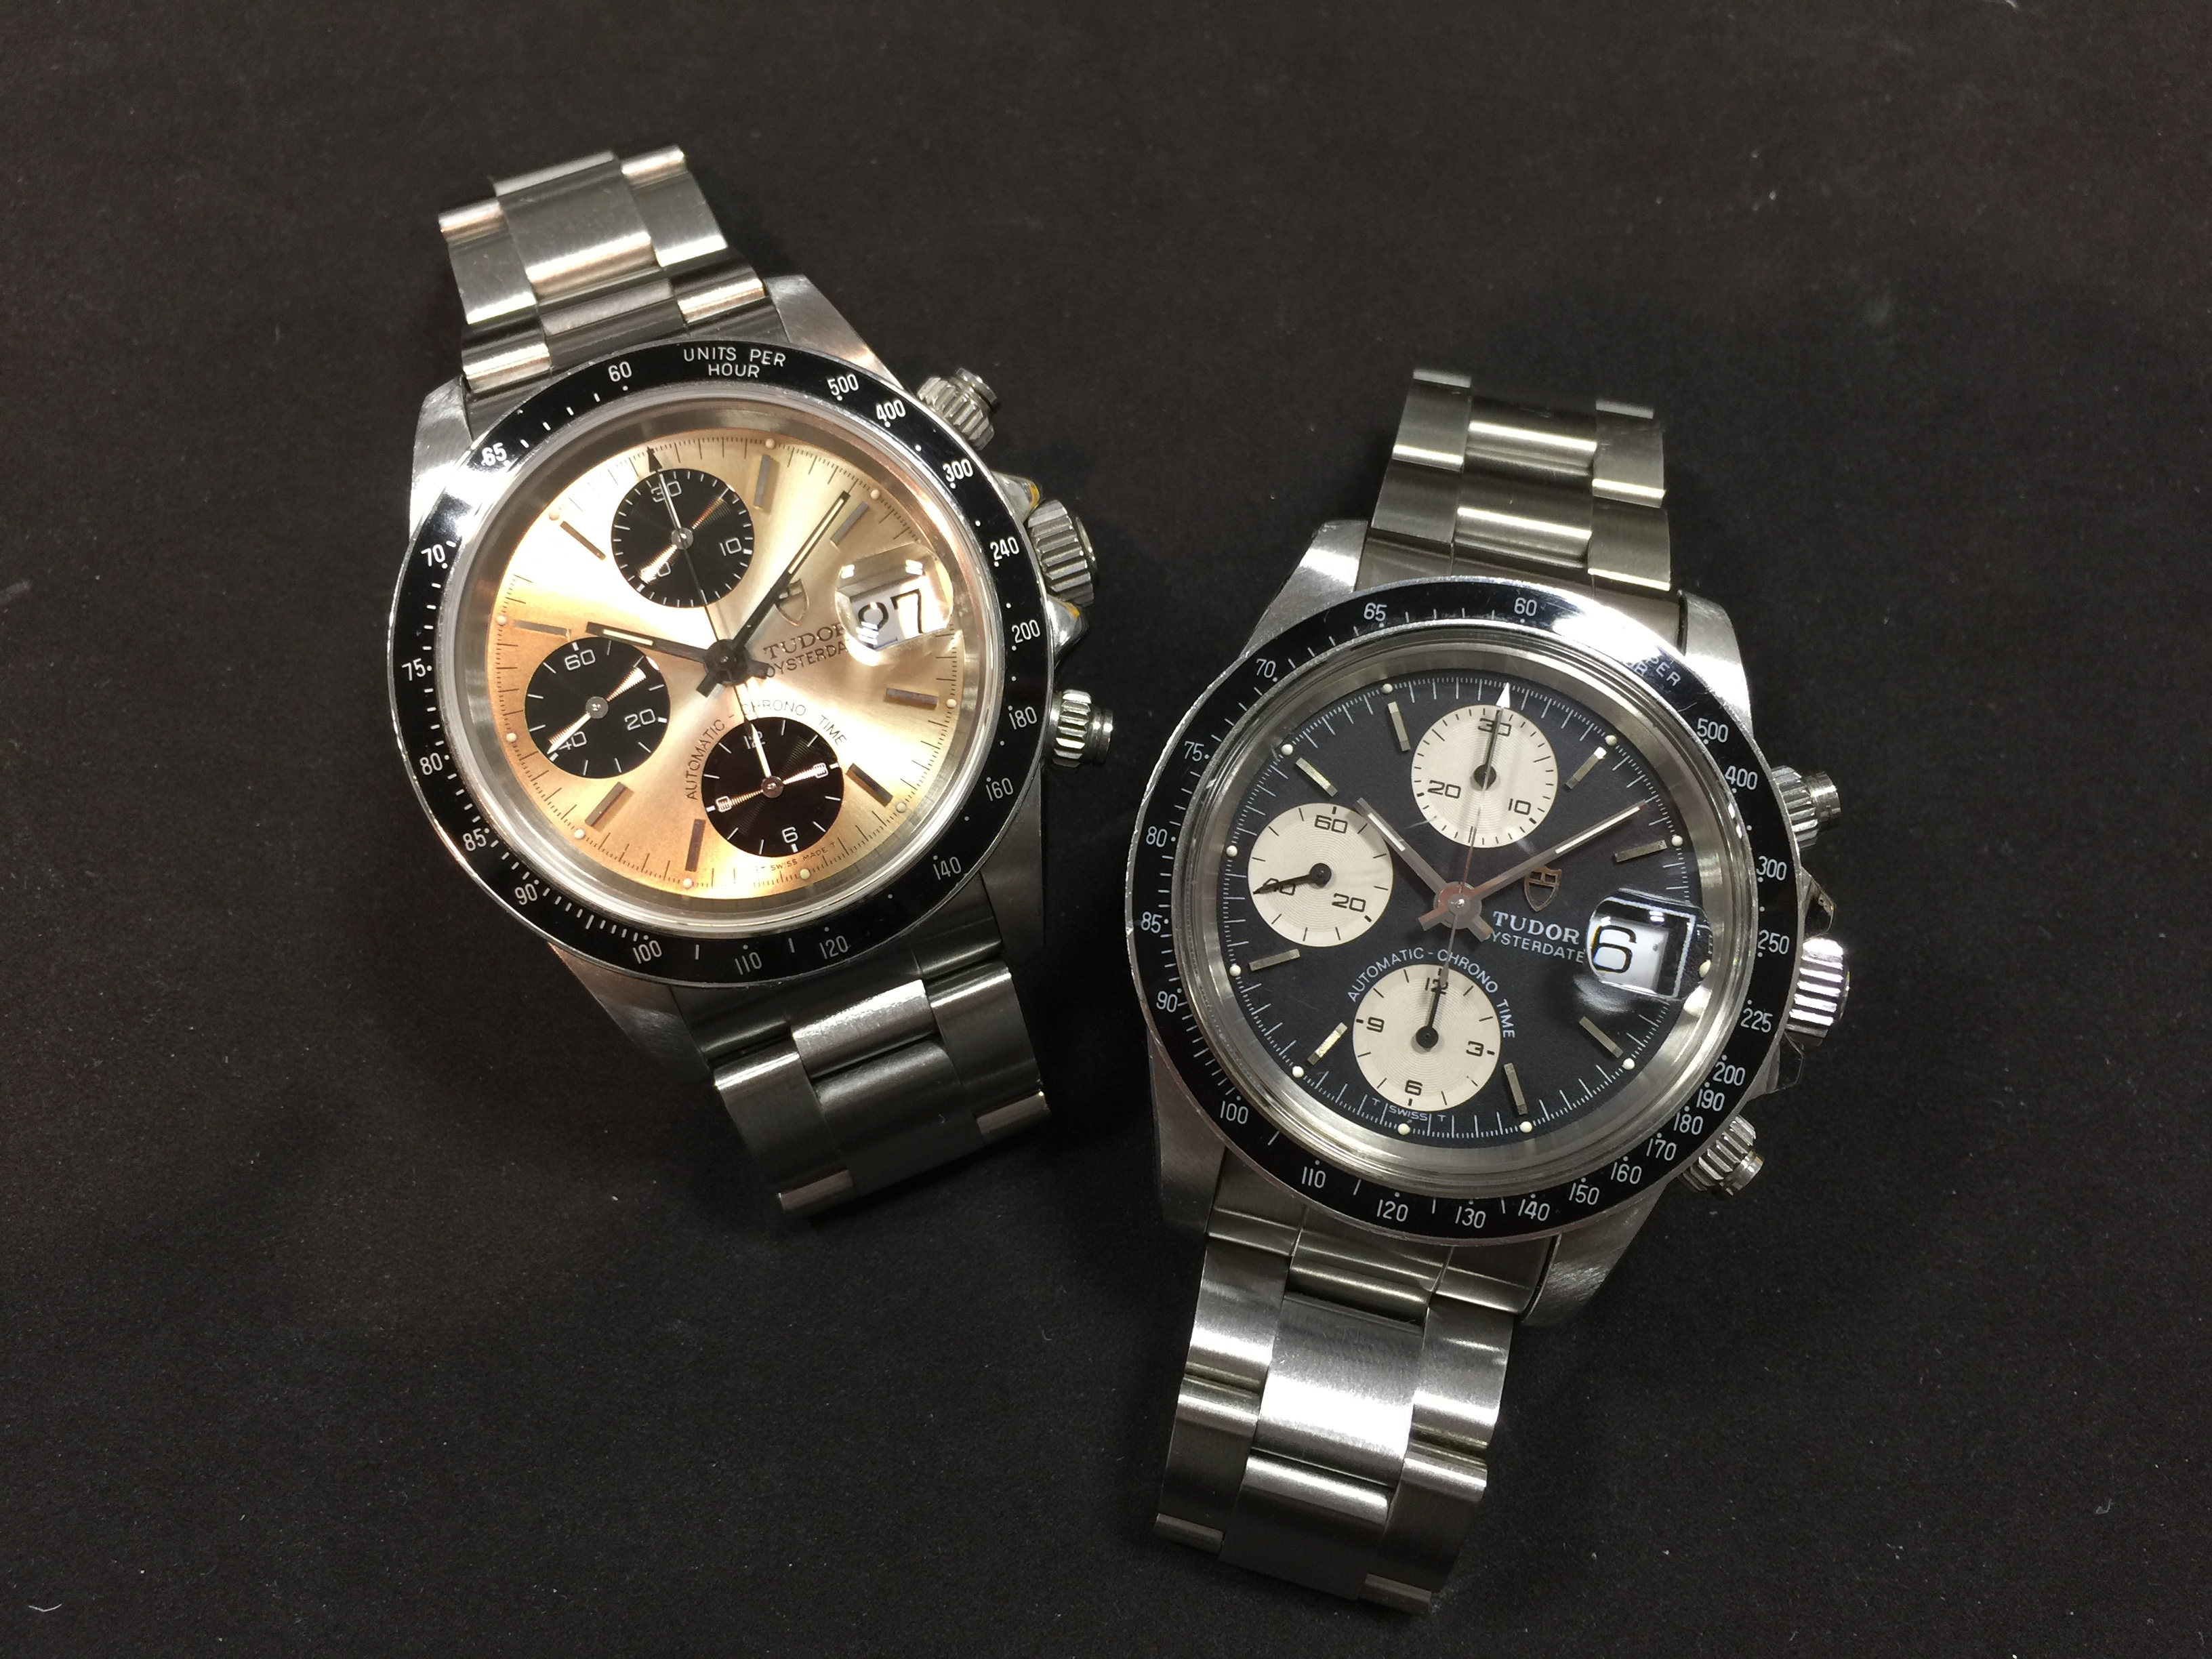 outlet store 2f012 e50a9 チュードル TUDOR クロノタイム 79160 , 79260 | 時計の高価買取 ...